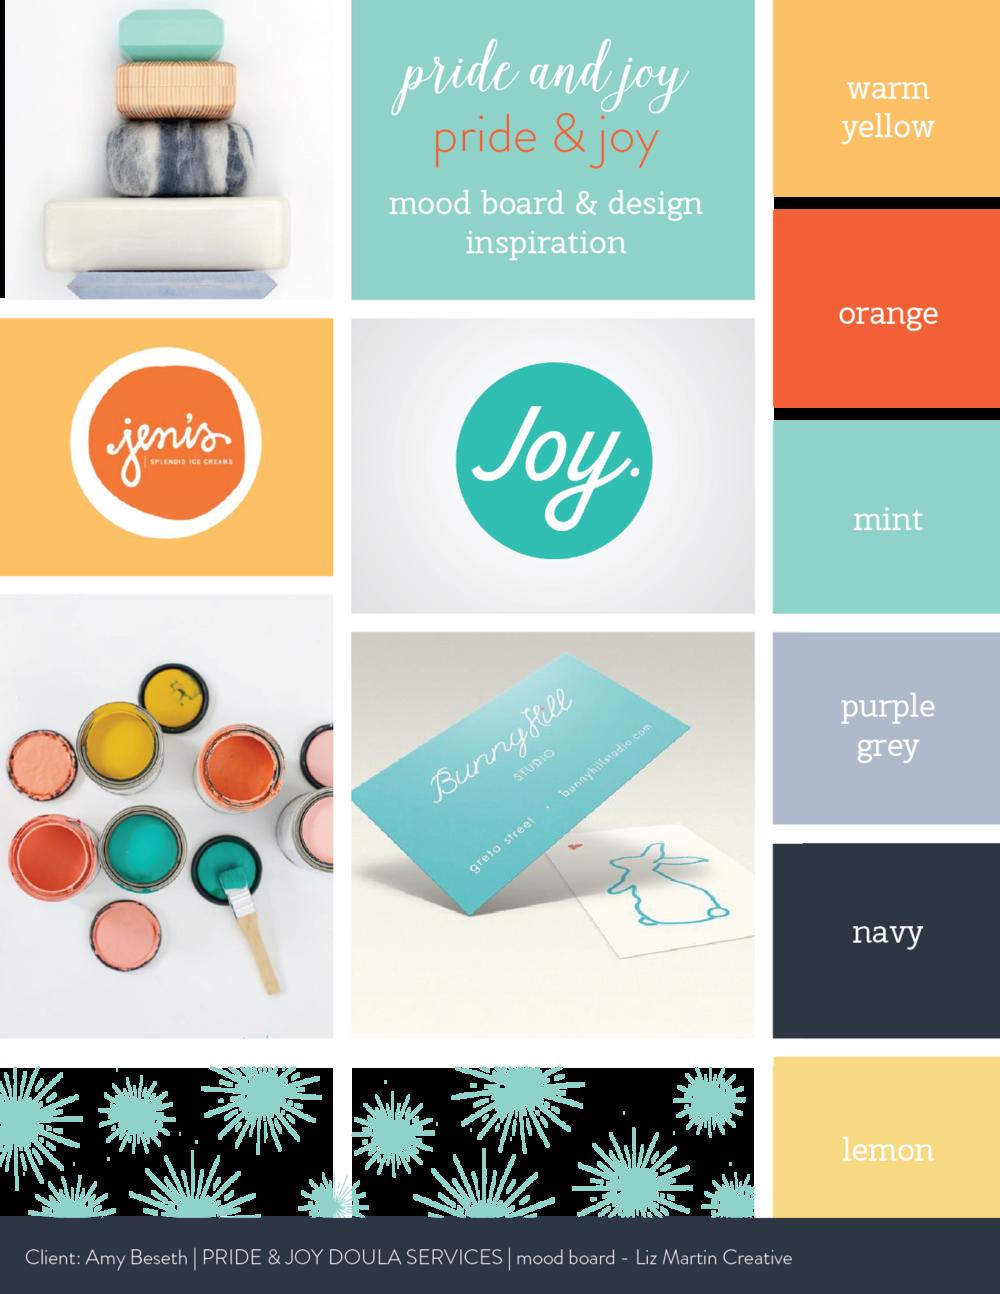 branding my logo design process in 5 steps liz martin creative